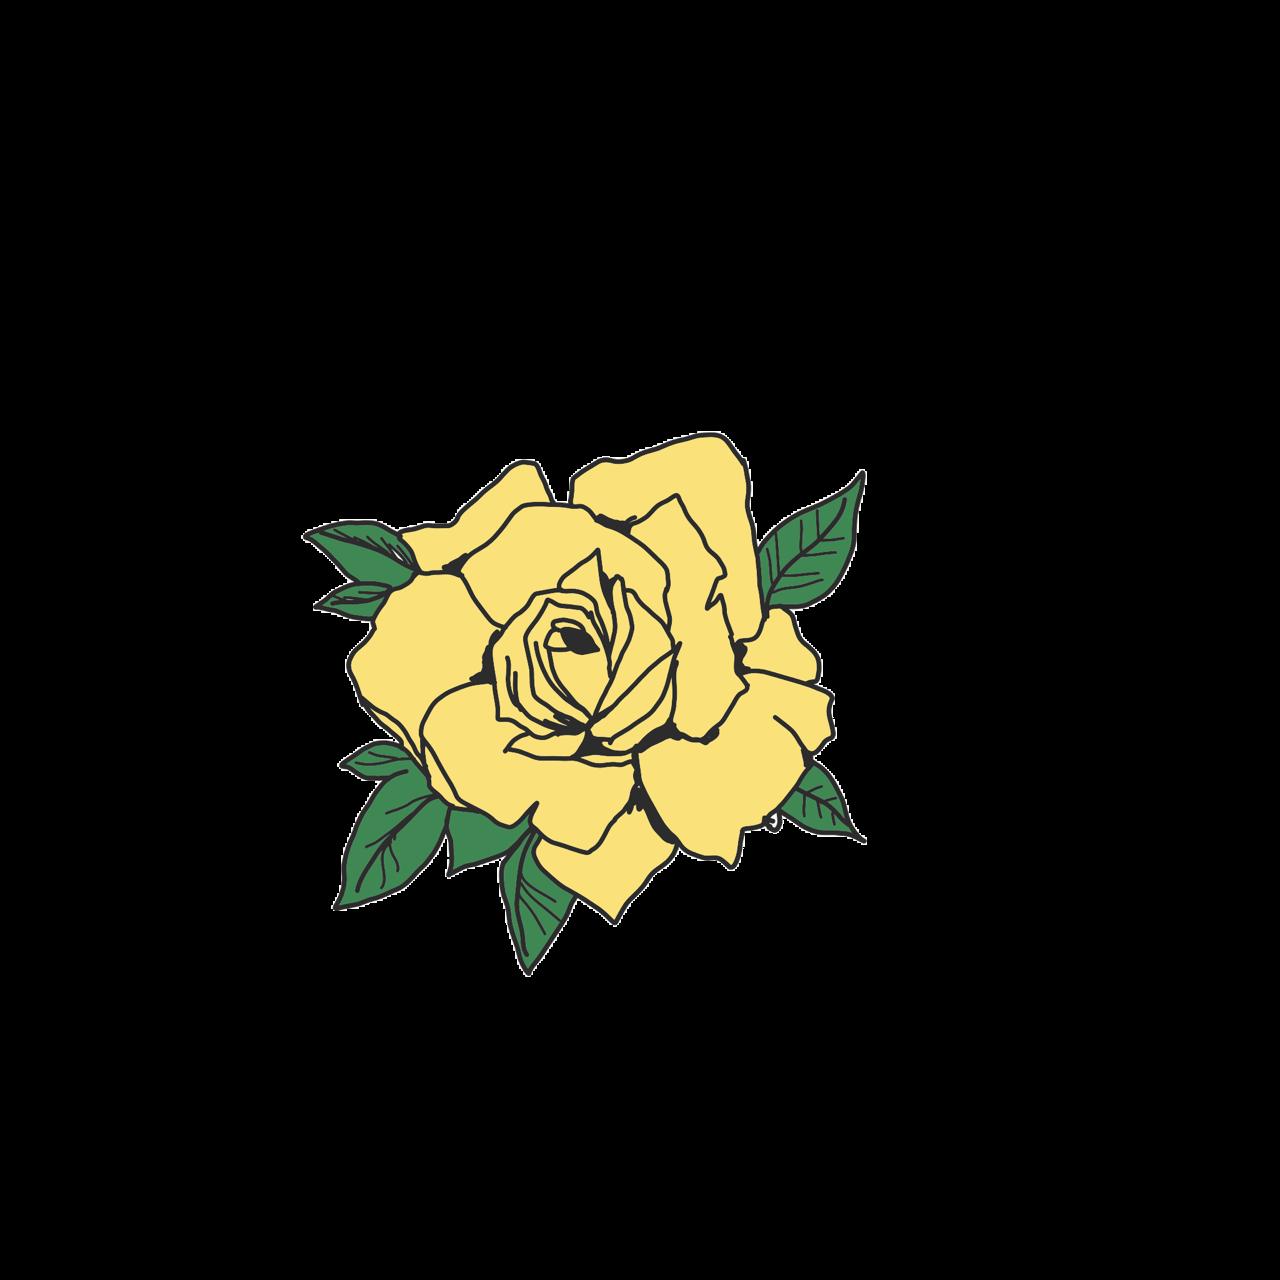 yellow yellowaesthetic aesthetic tumblr rose rosa...